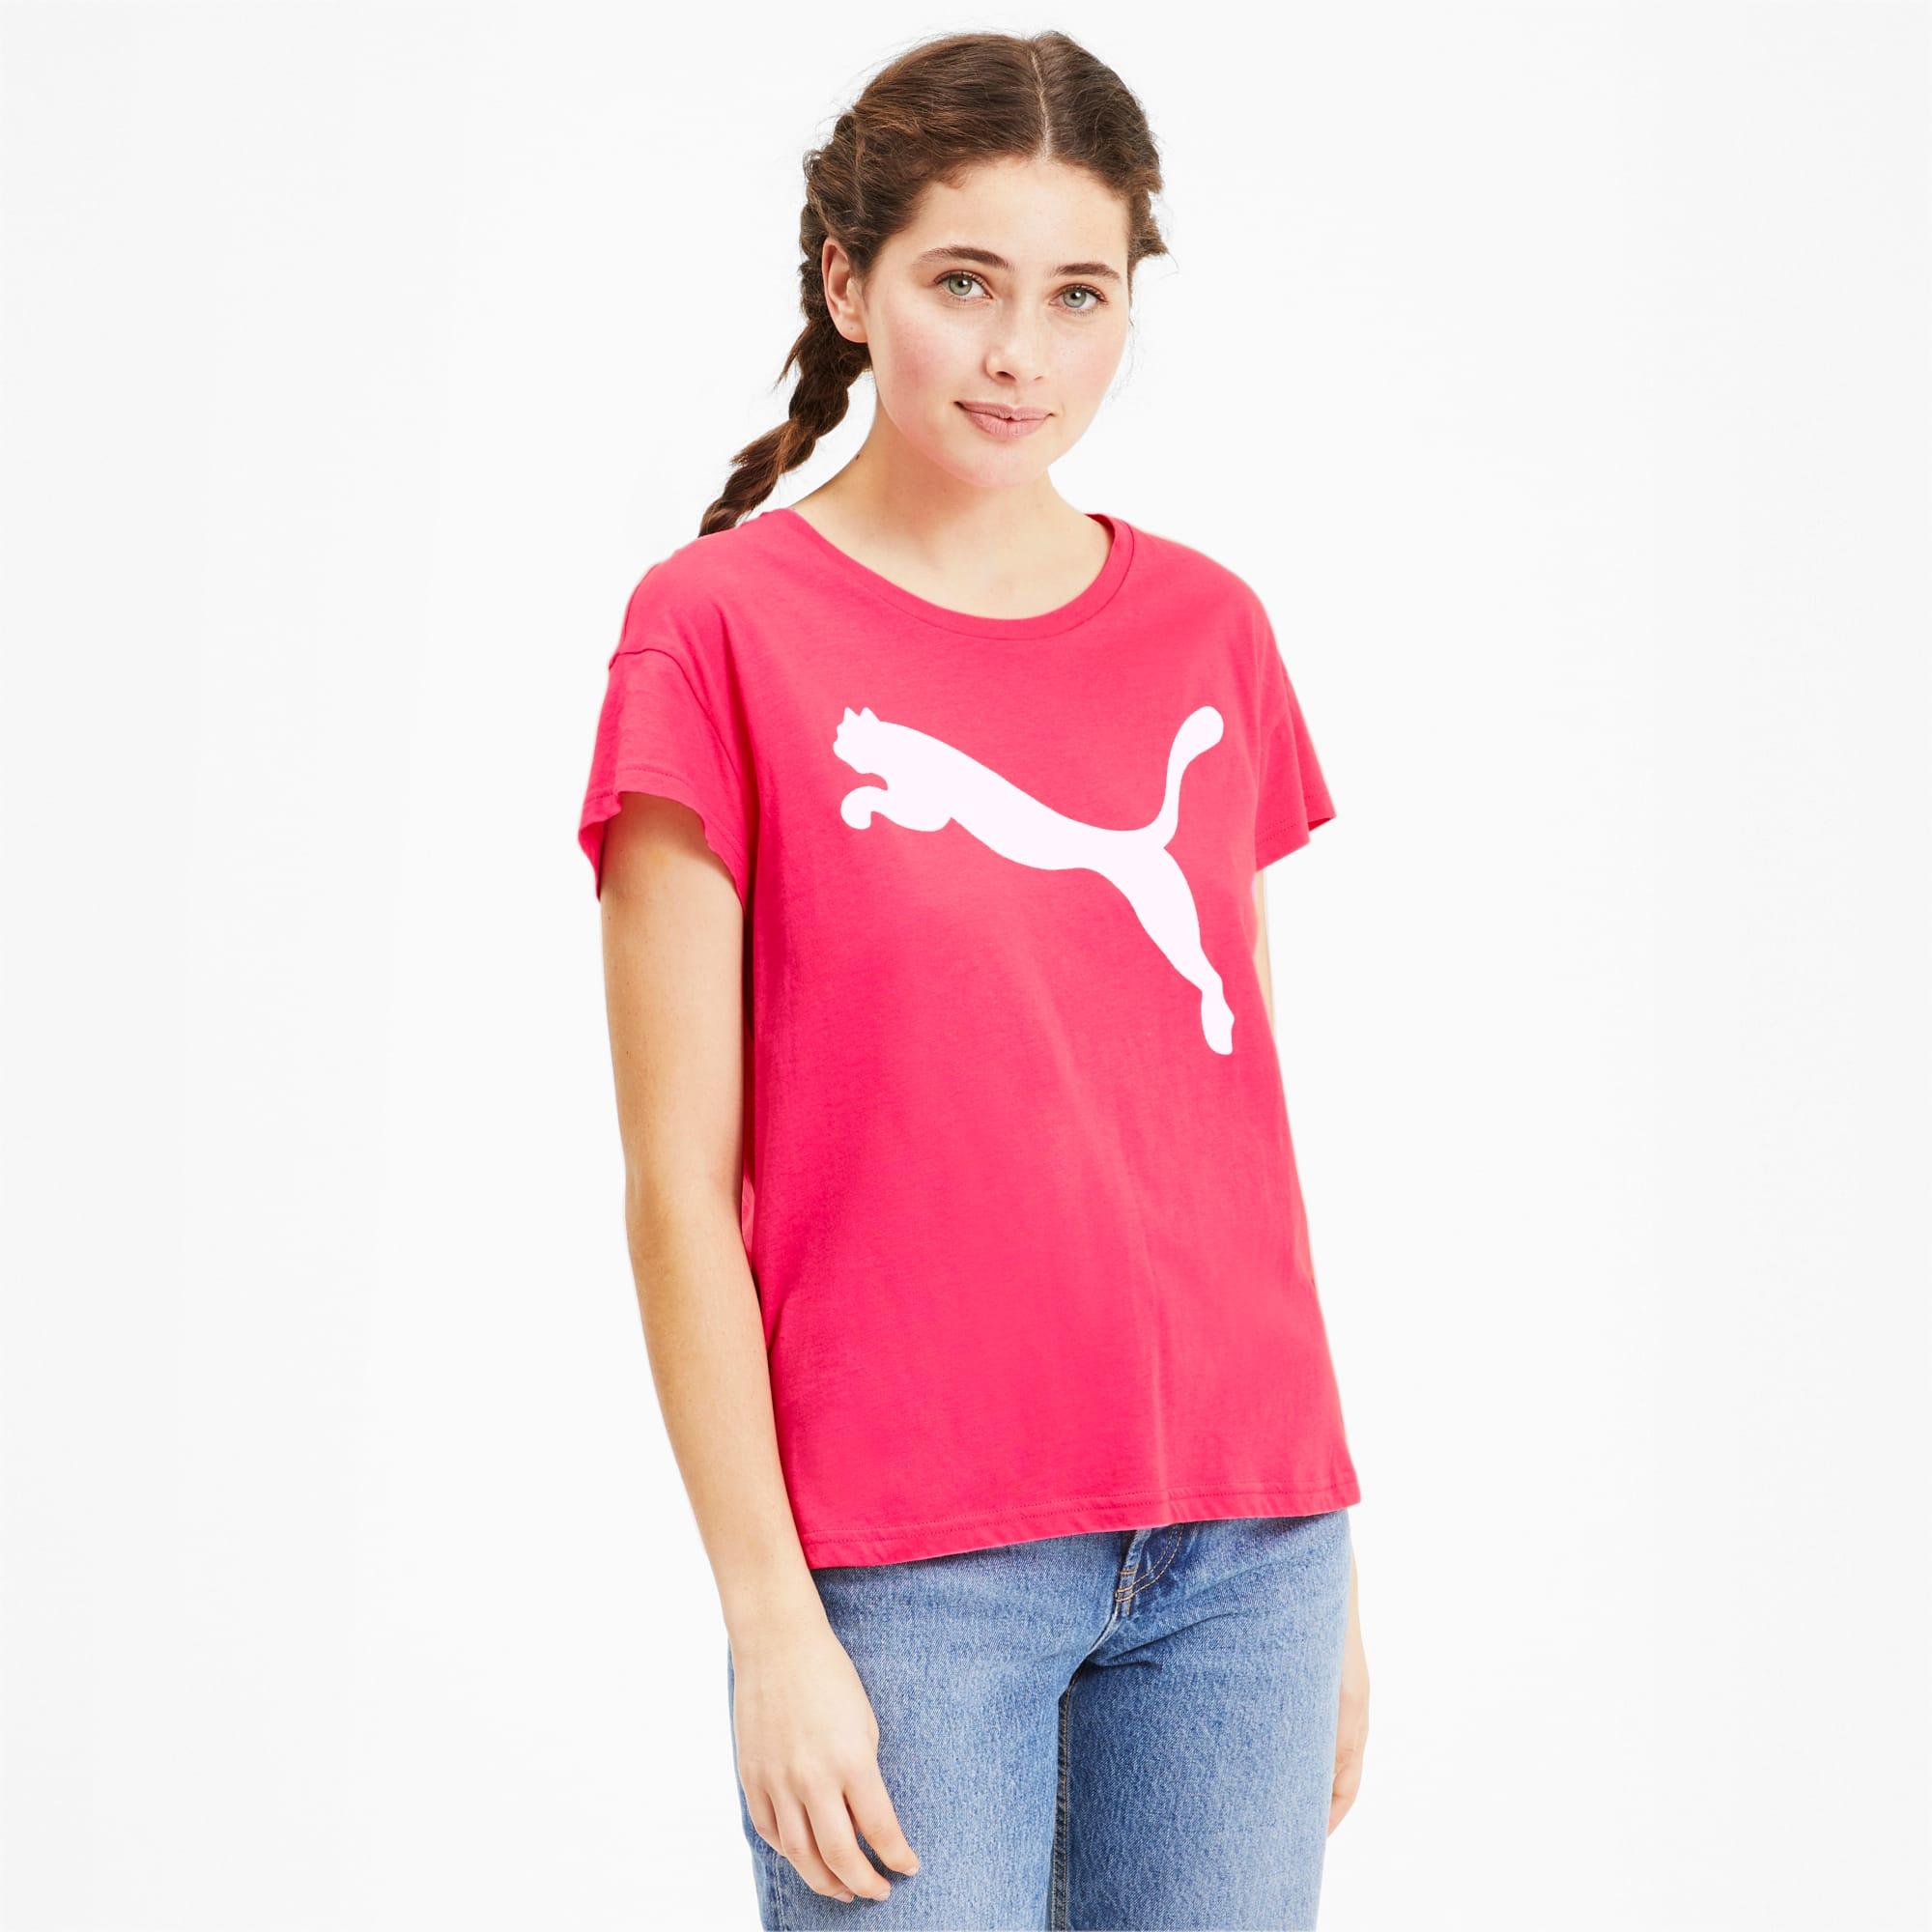 puma -  Active Damen T-Shirt   Rosa   Größe: L